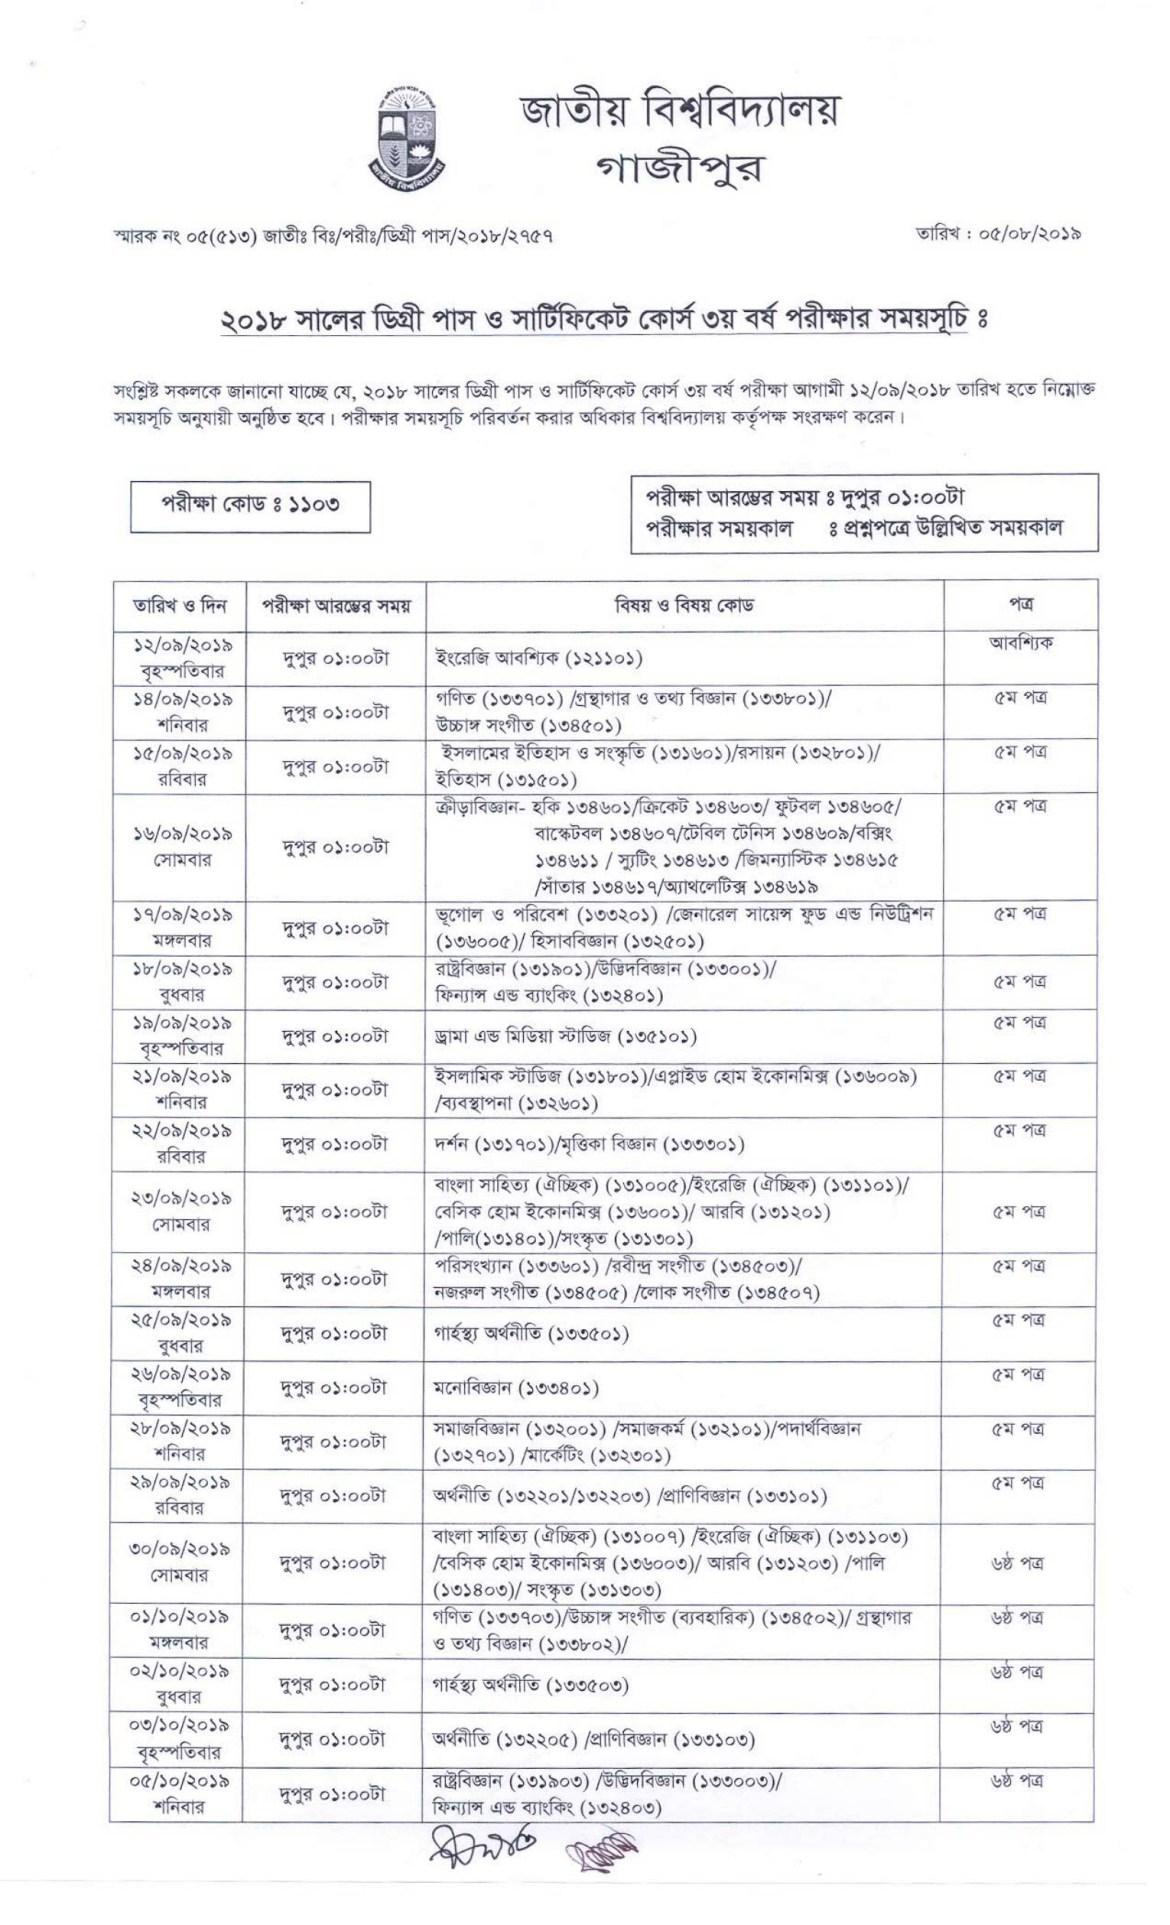 NU Degree 3rd Year Exam Routine 2019 PDF Download